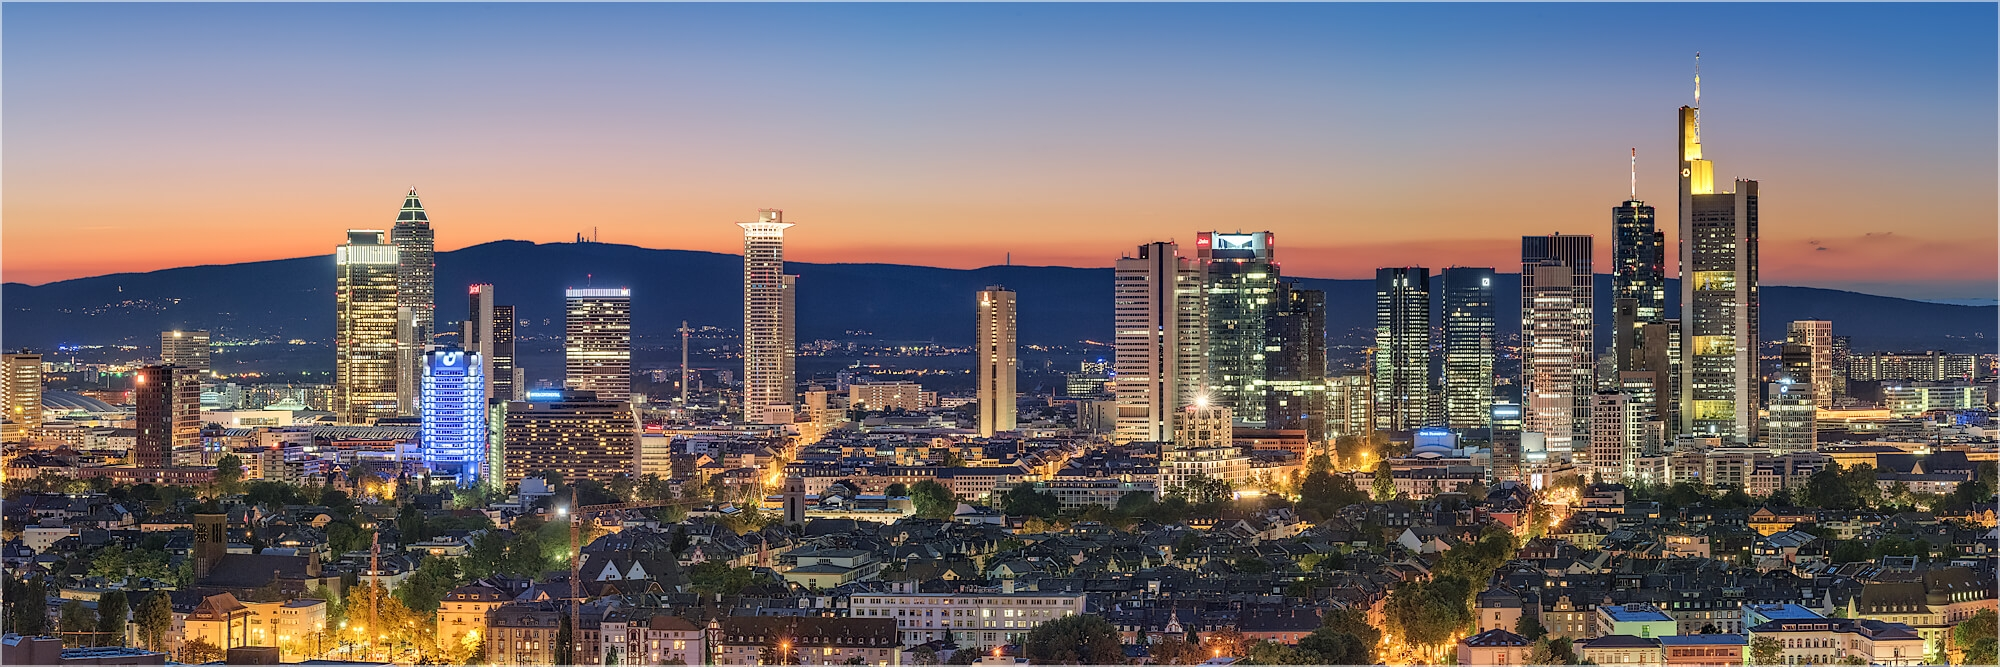 Panoramabild Skyline von Frankfurt/Main